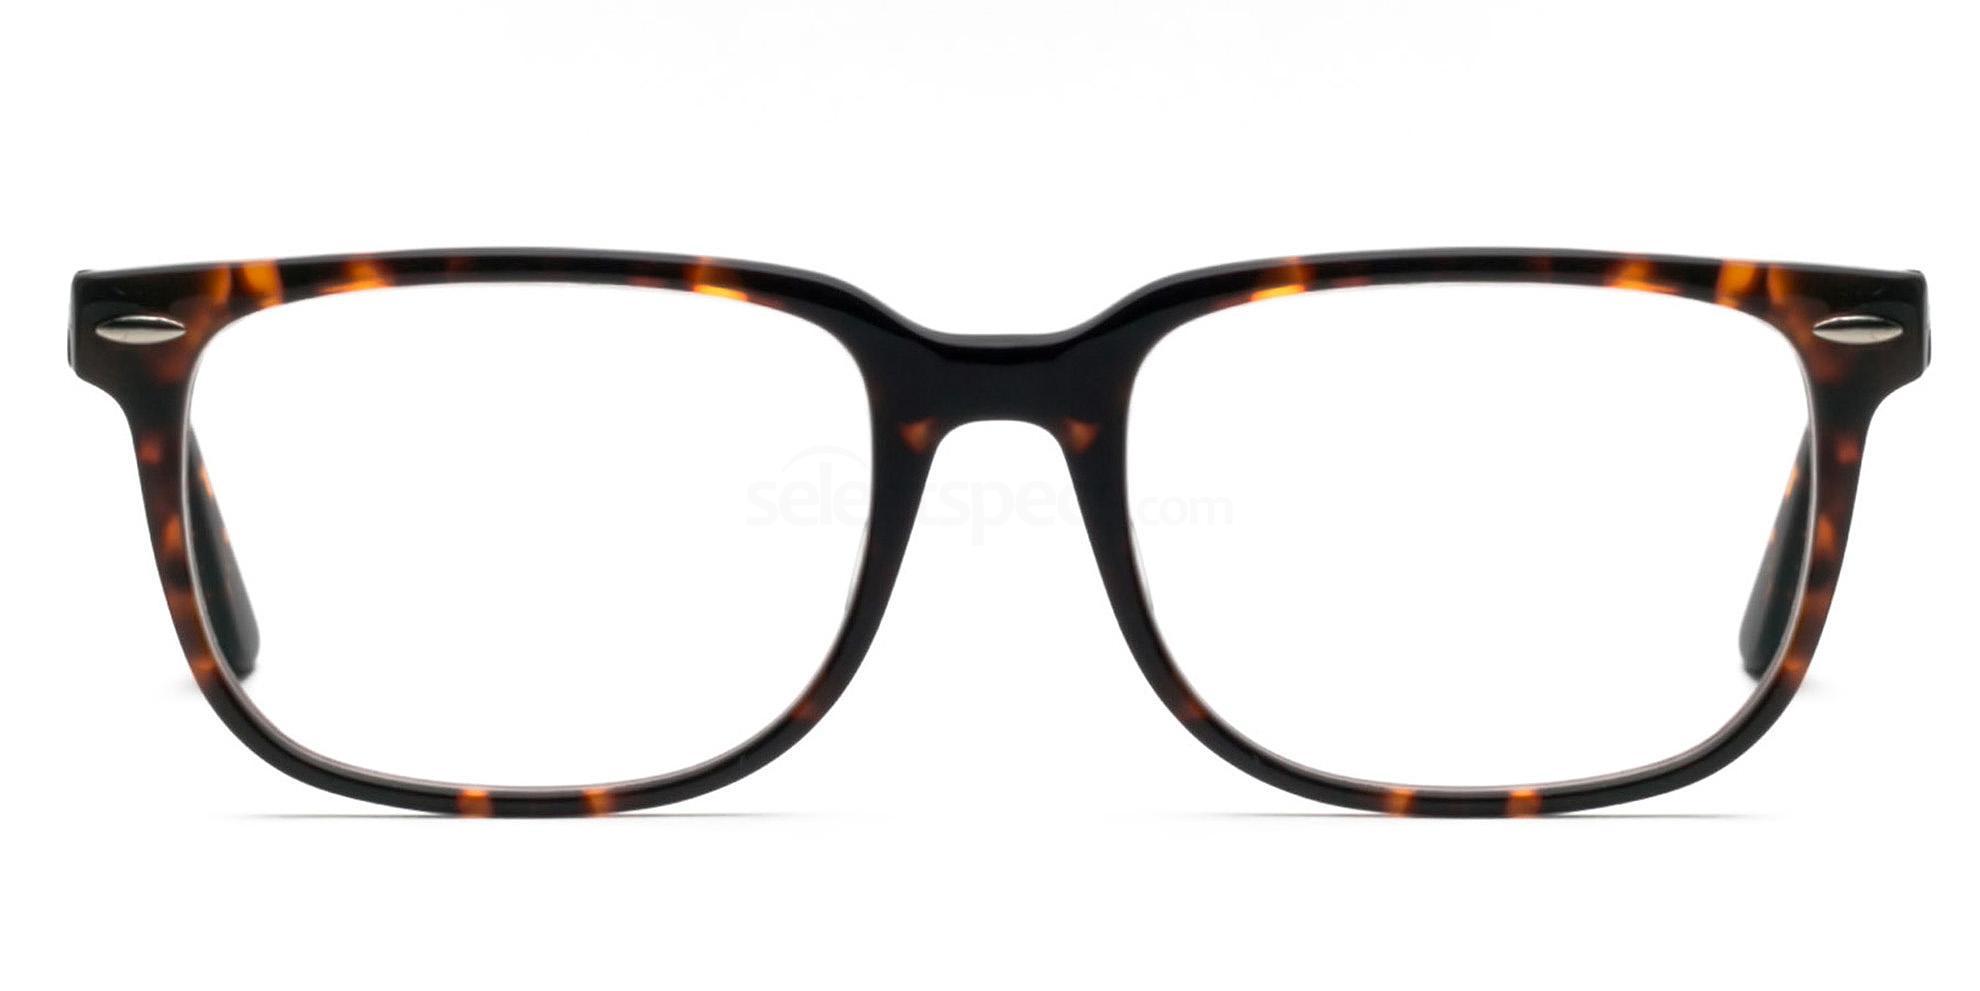 C003 E9855 Glasses, SelectSpecs